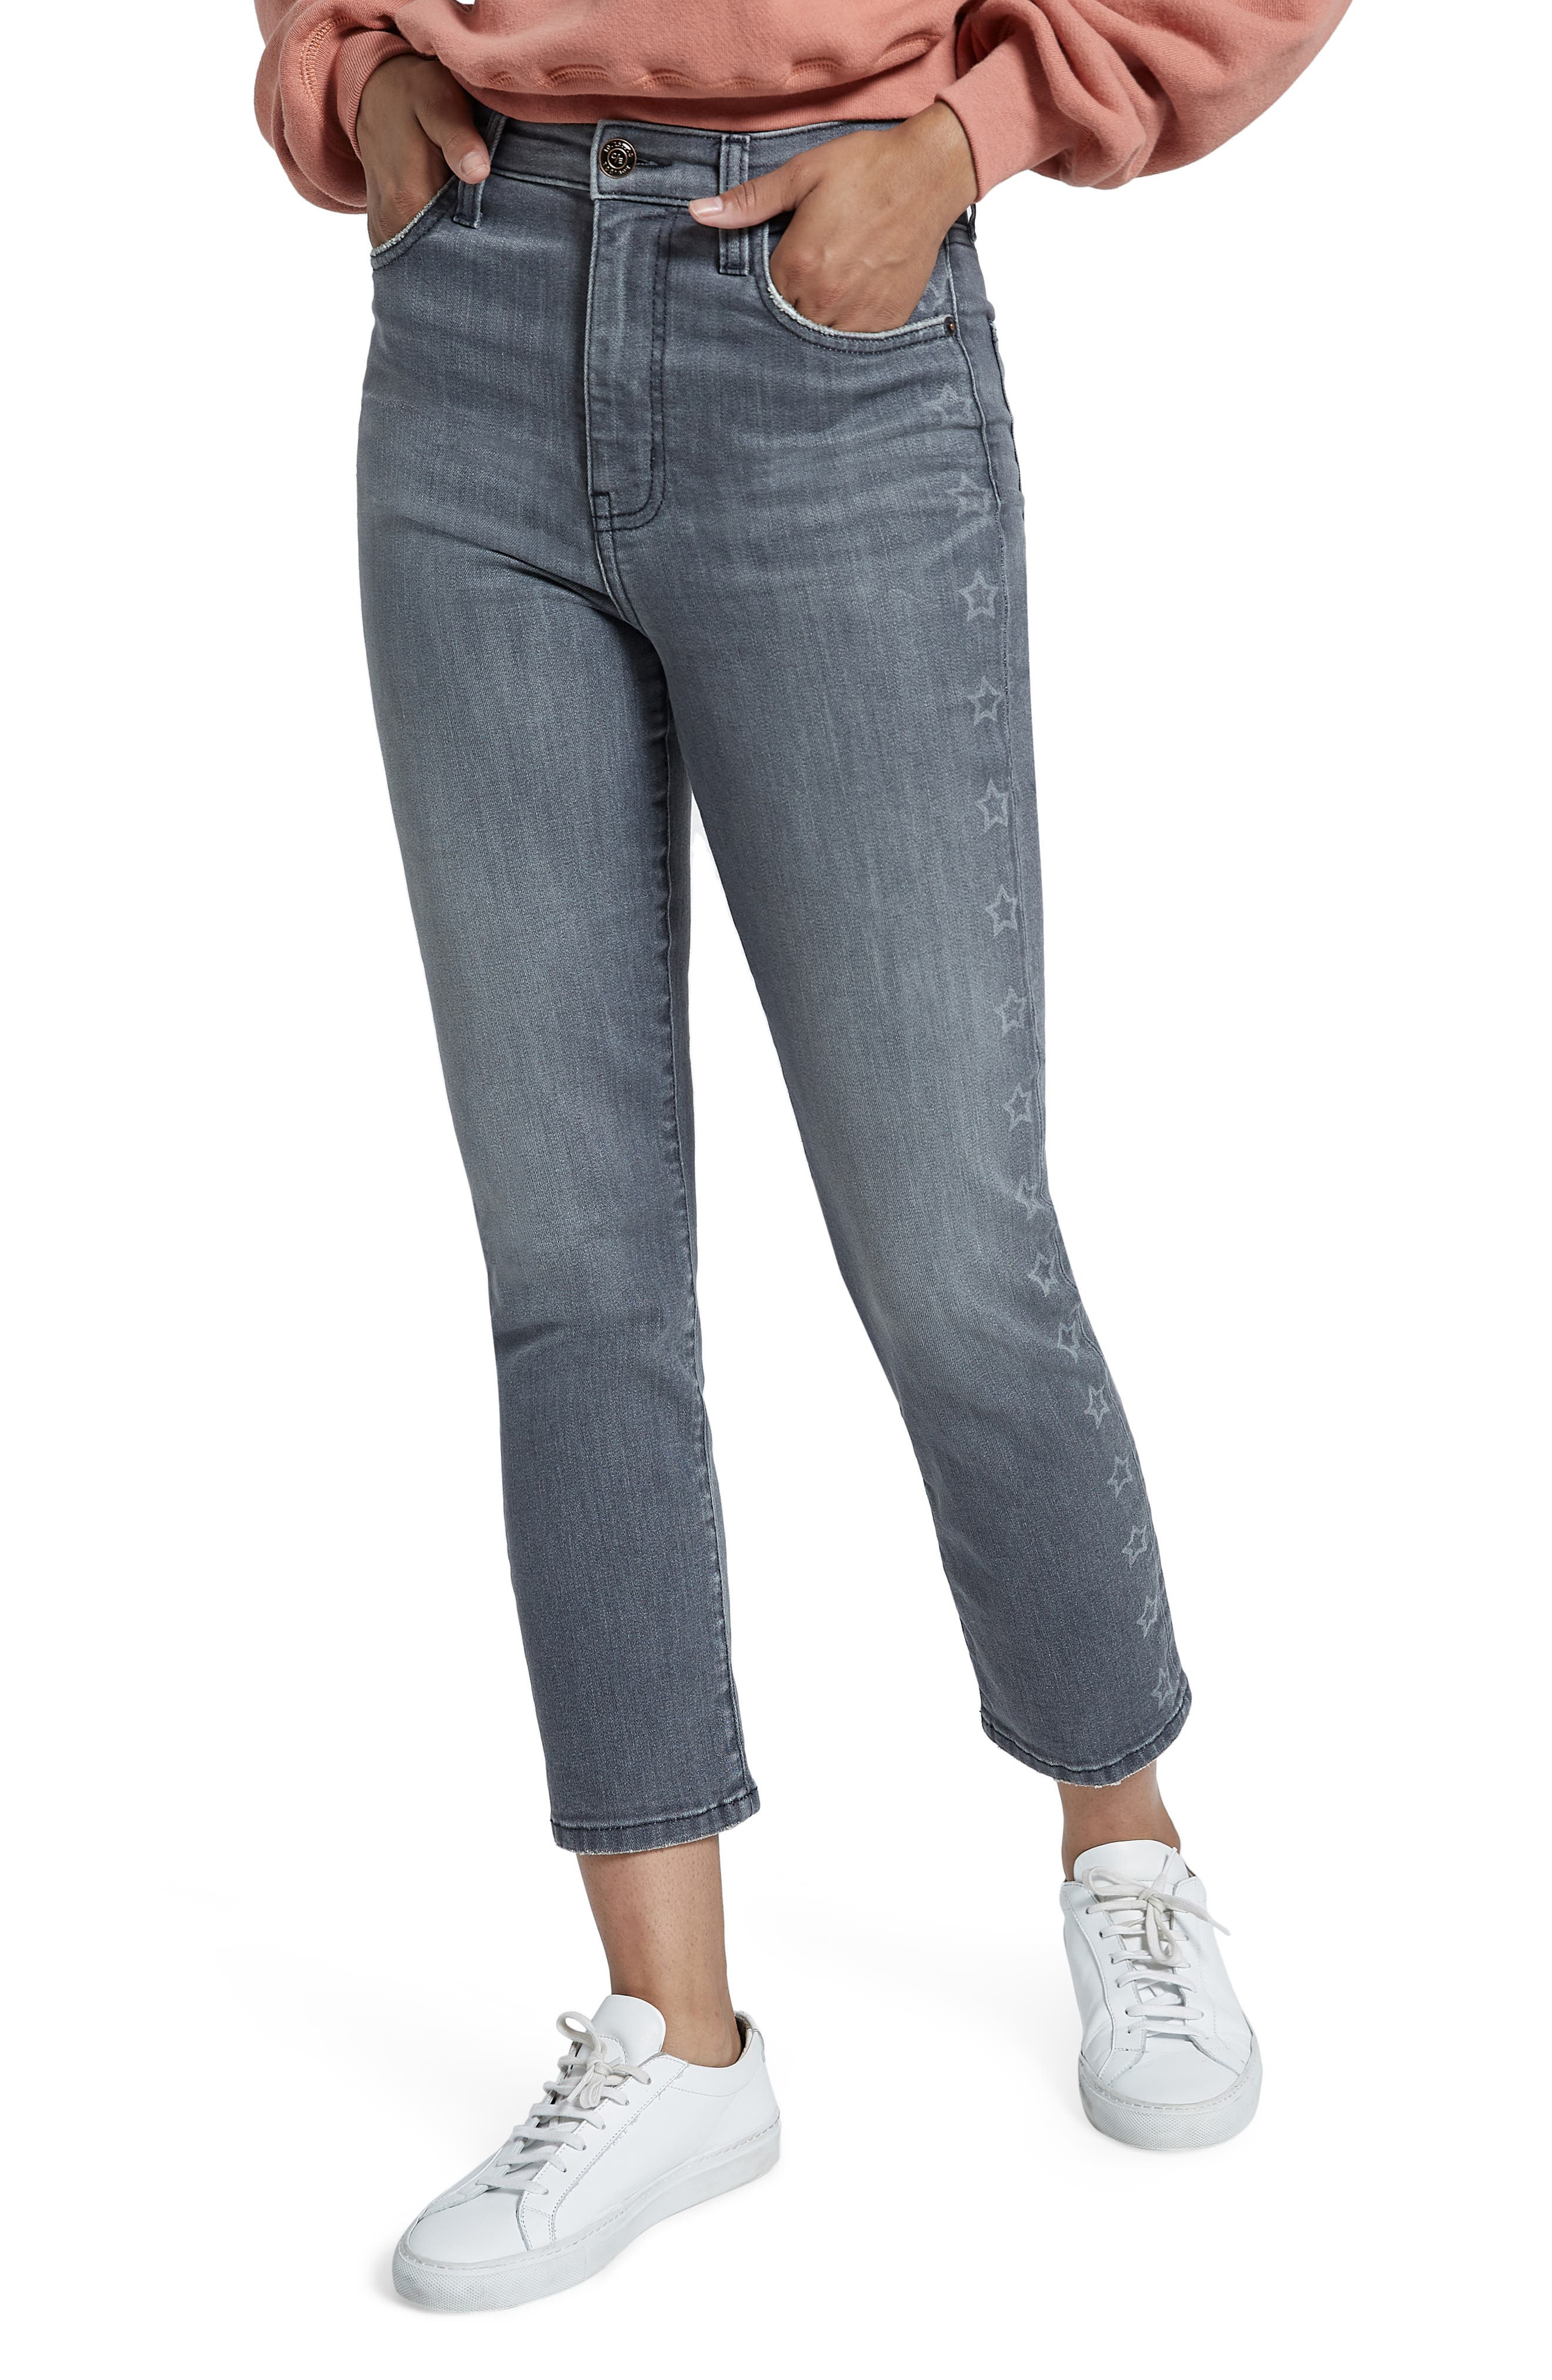 Women's Current/elliott The Original High Waist Star Stripe Cigarette Jeans